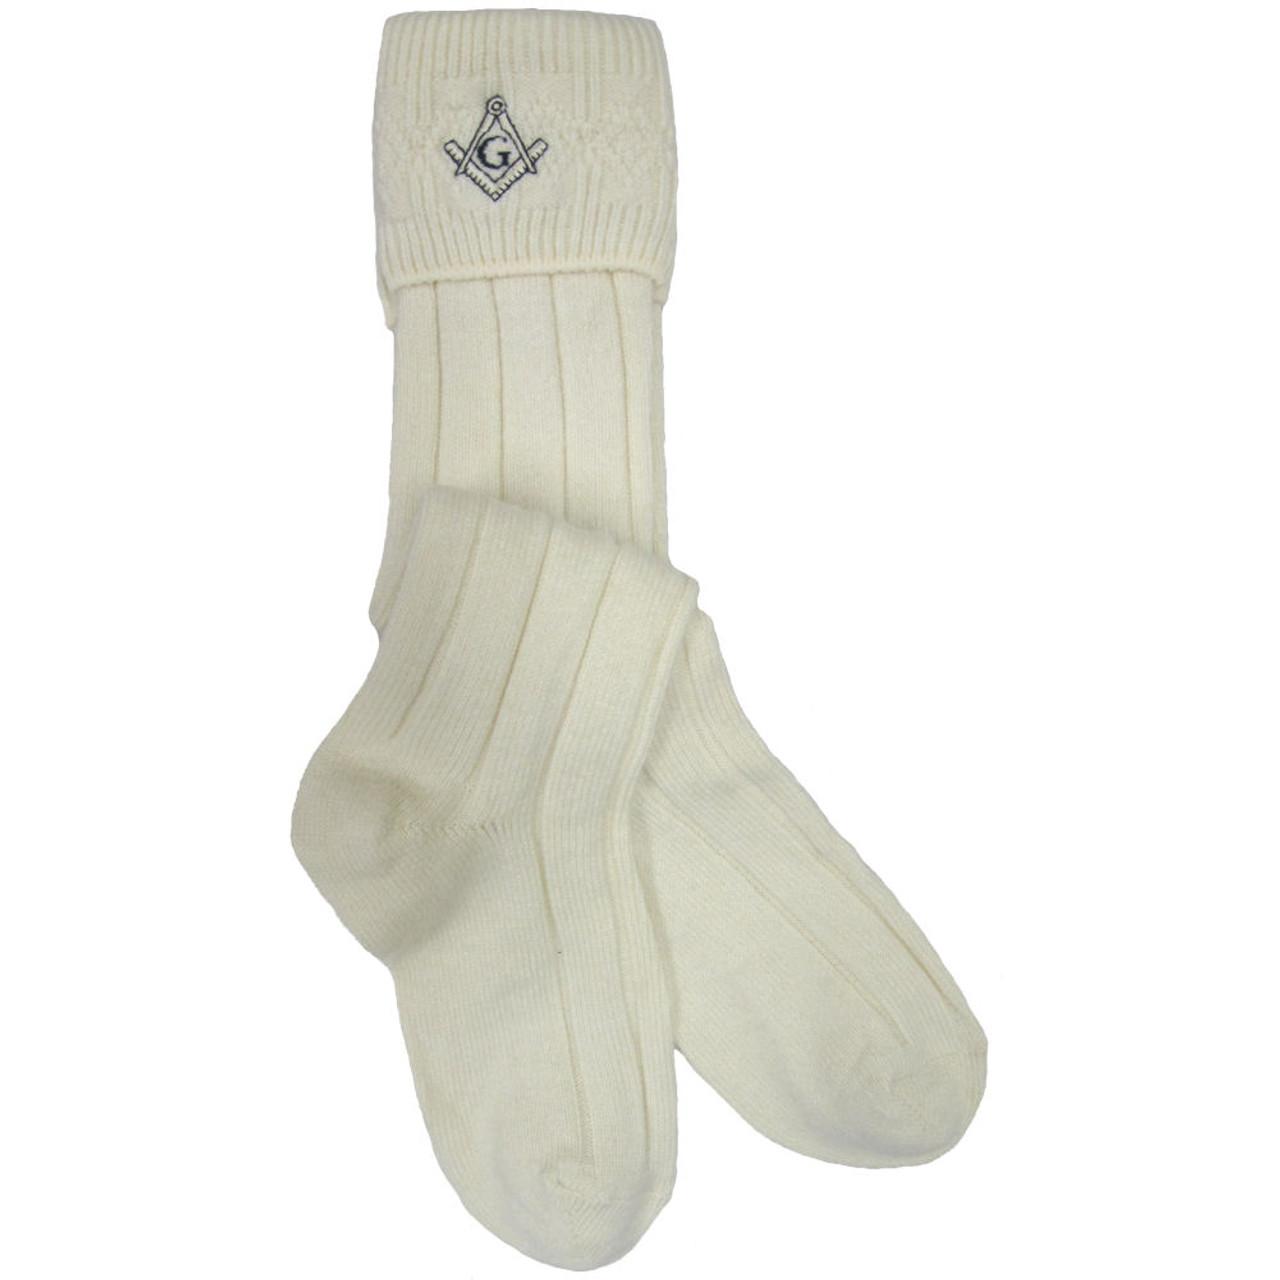 Ecru Kilt Hose//Socks With Scottish Thistle Size 9.5-13